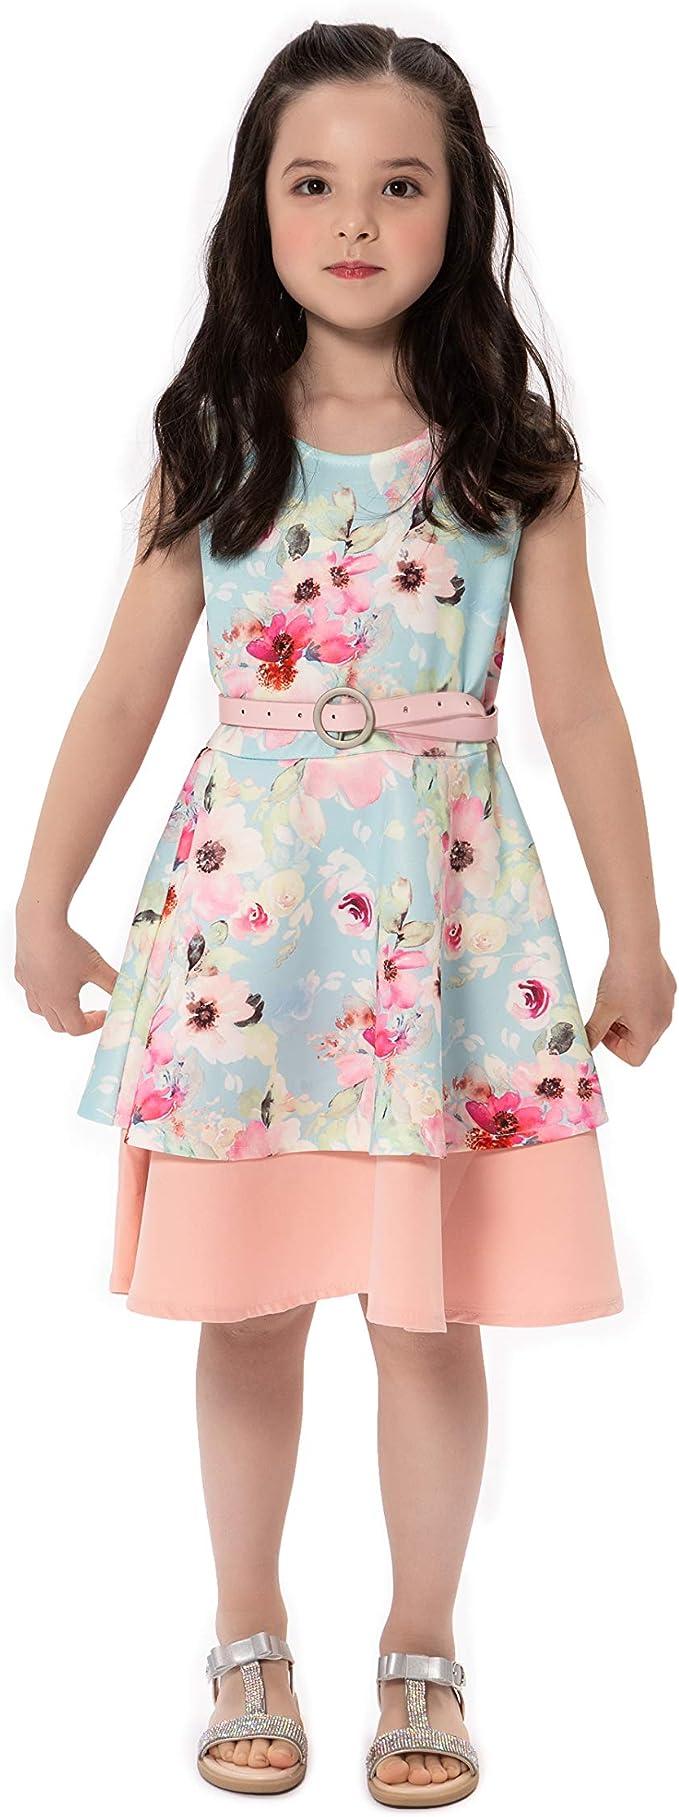 AM/_ CUTE BABY GIRL SUMMER SLEEVELESS LOOSE LACE FLOWER BACK DRESS SUNDRESS NICE